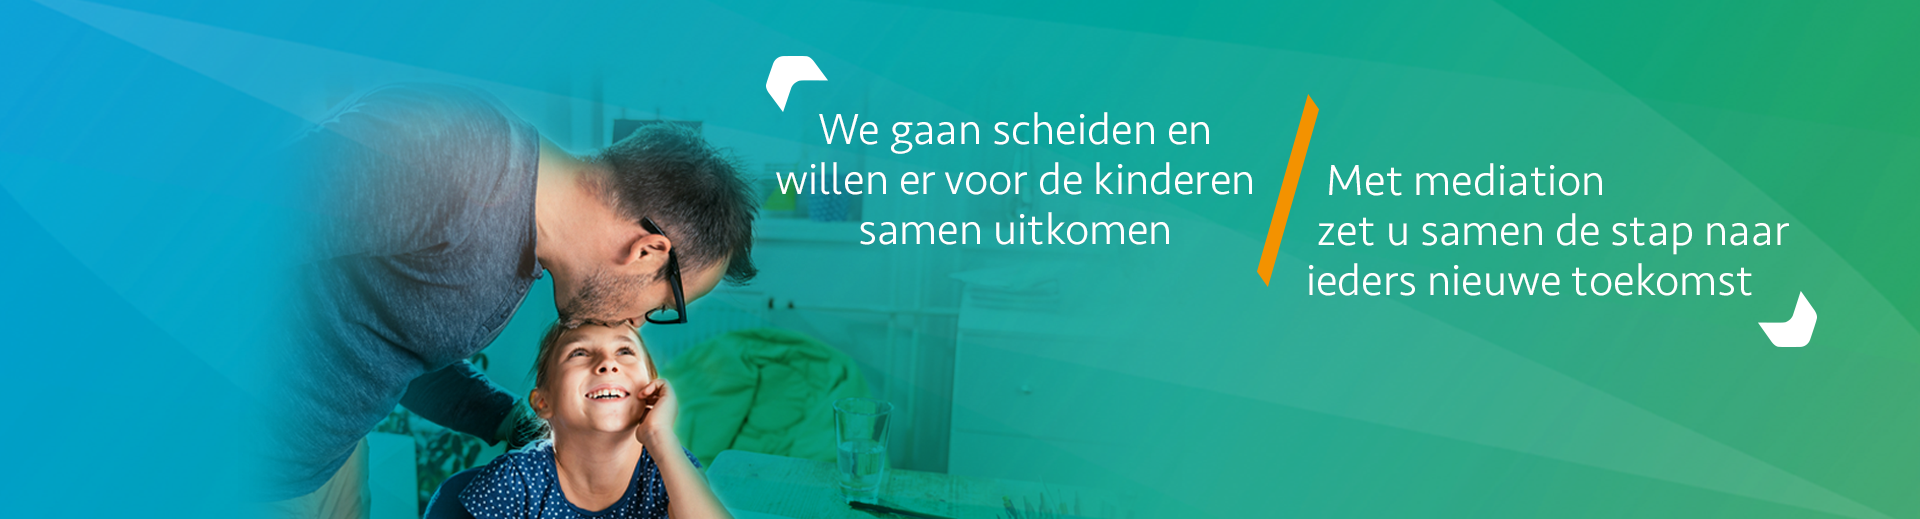 Mediation - Scheidingsplanner Den Haag & Rijswijk